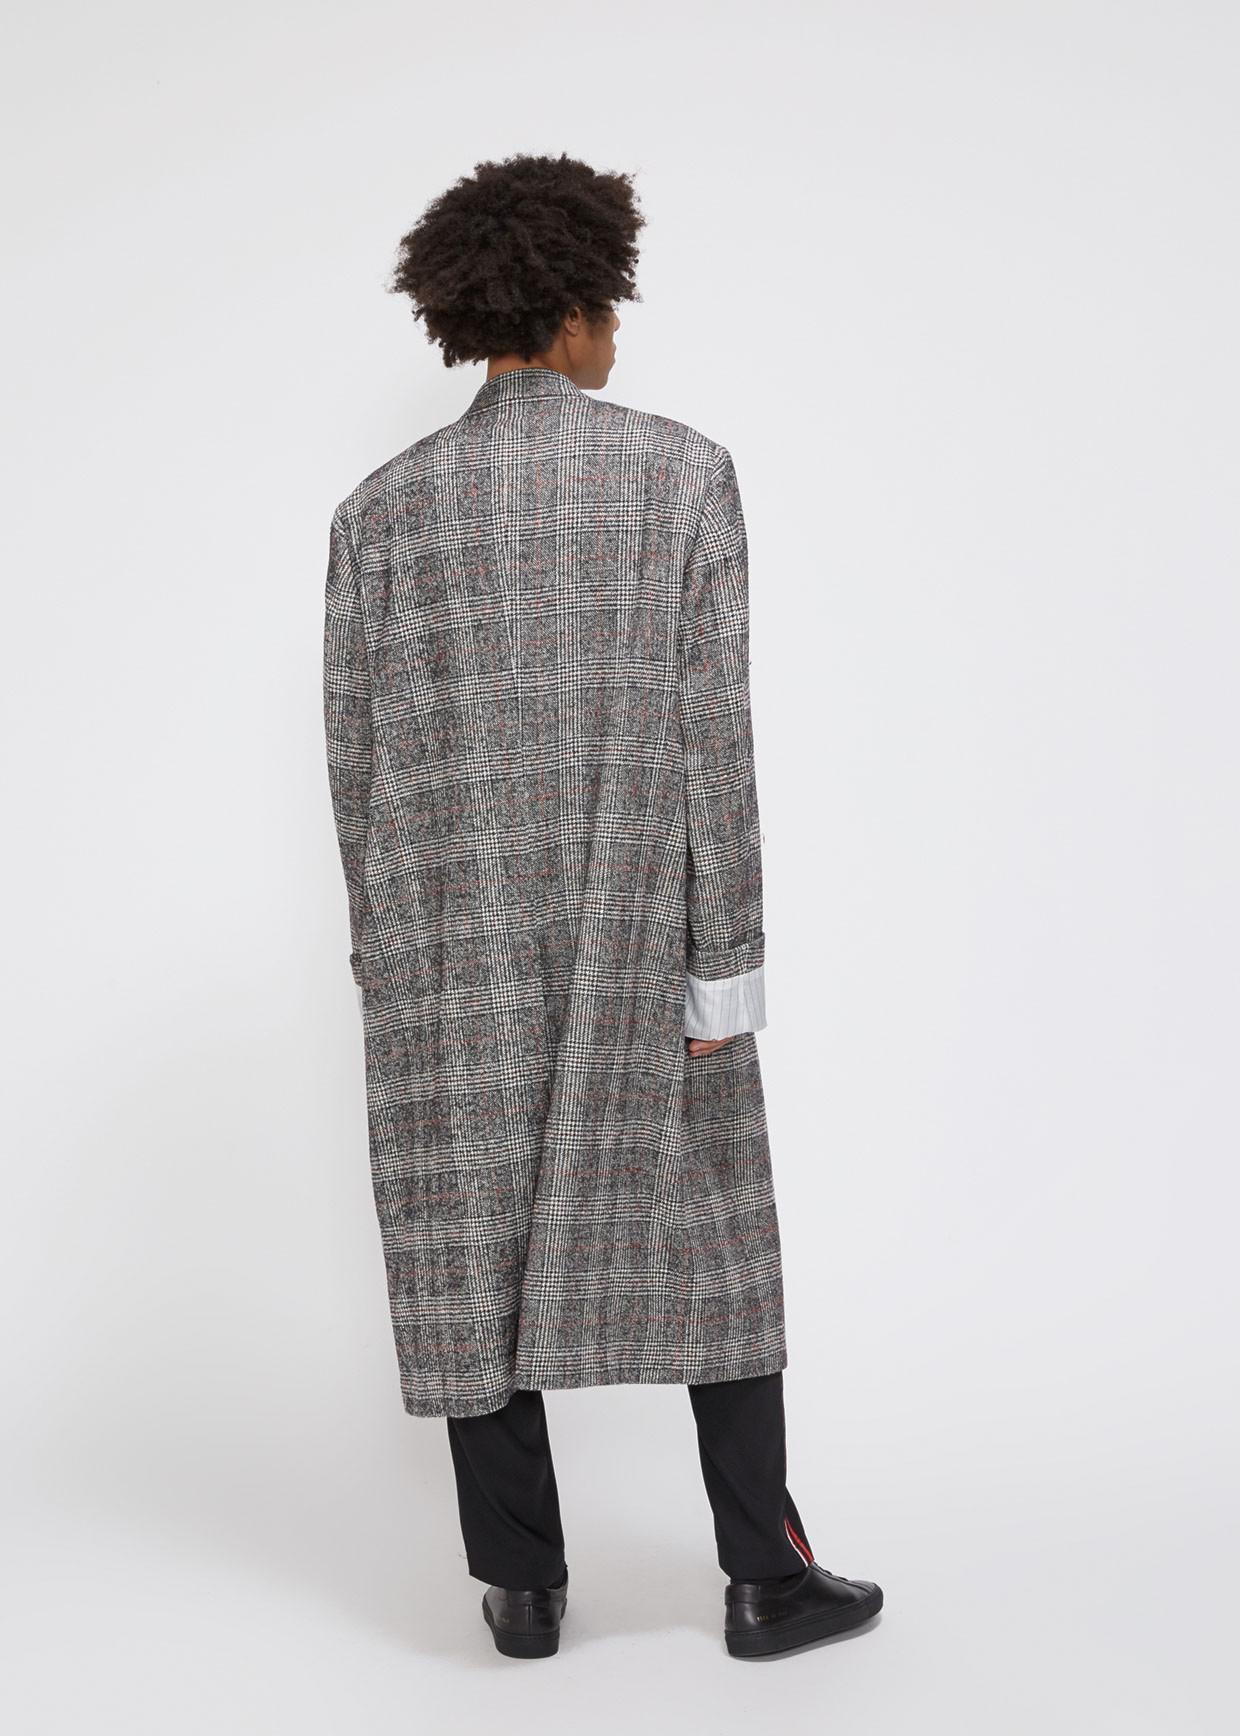 3d4dc069efd5 Lyst - Cmmn Swdn Ruben Double-breasted Coat in Gray for Men